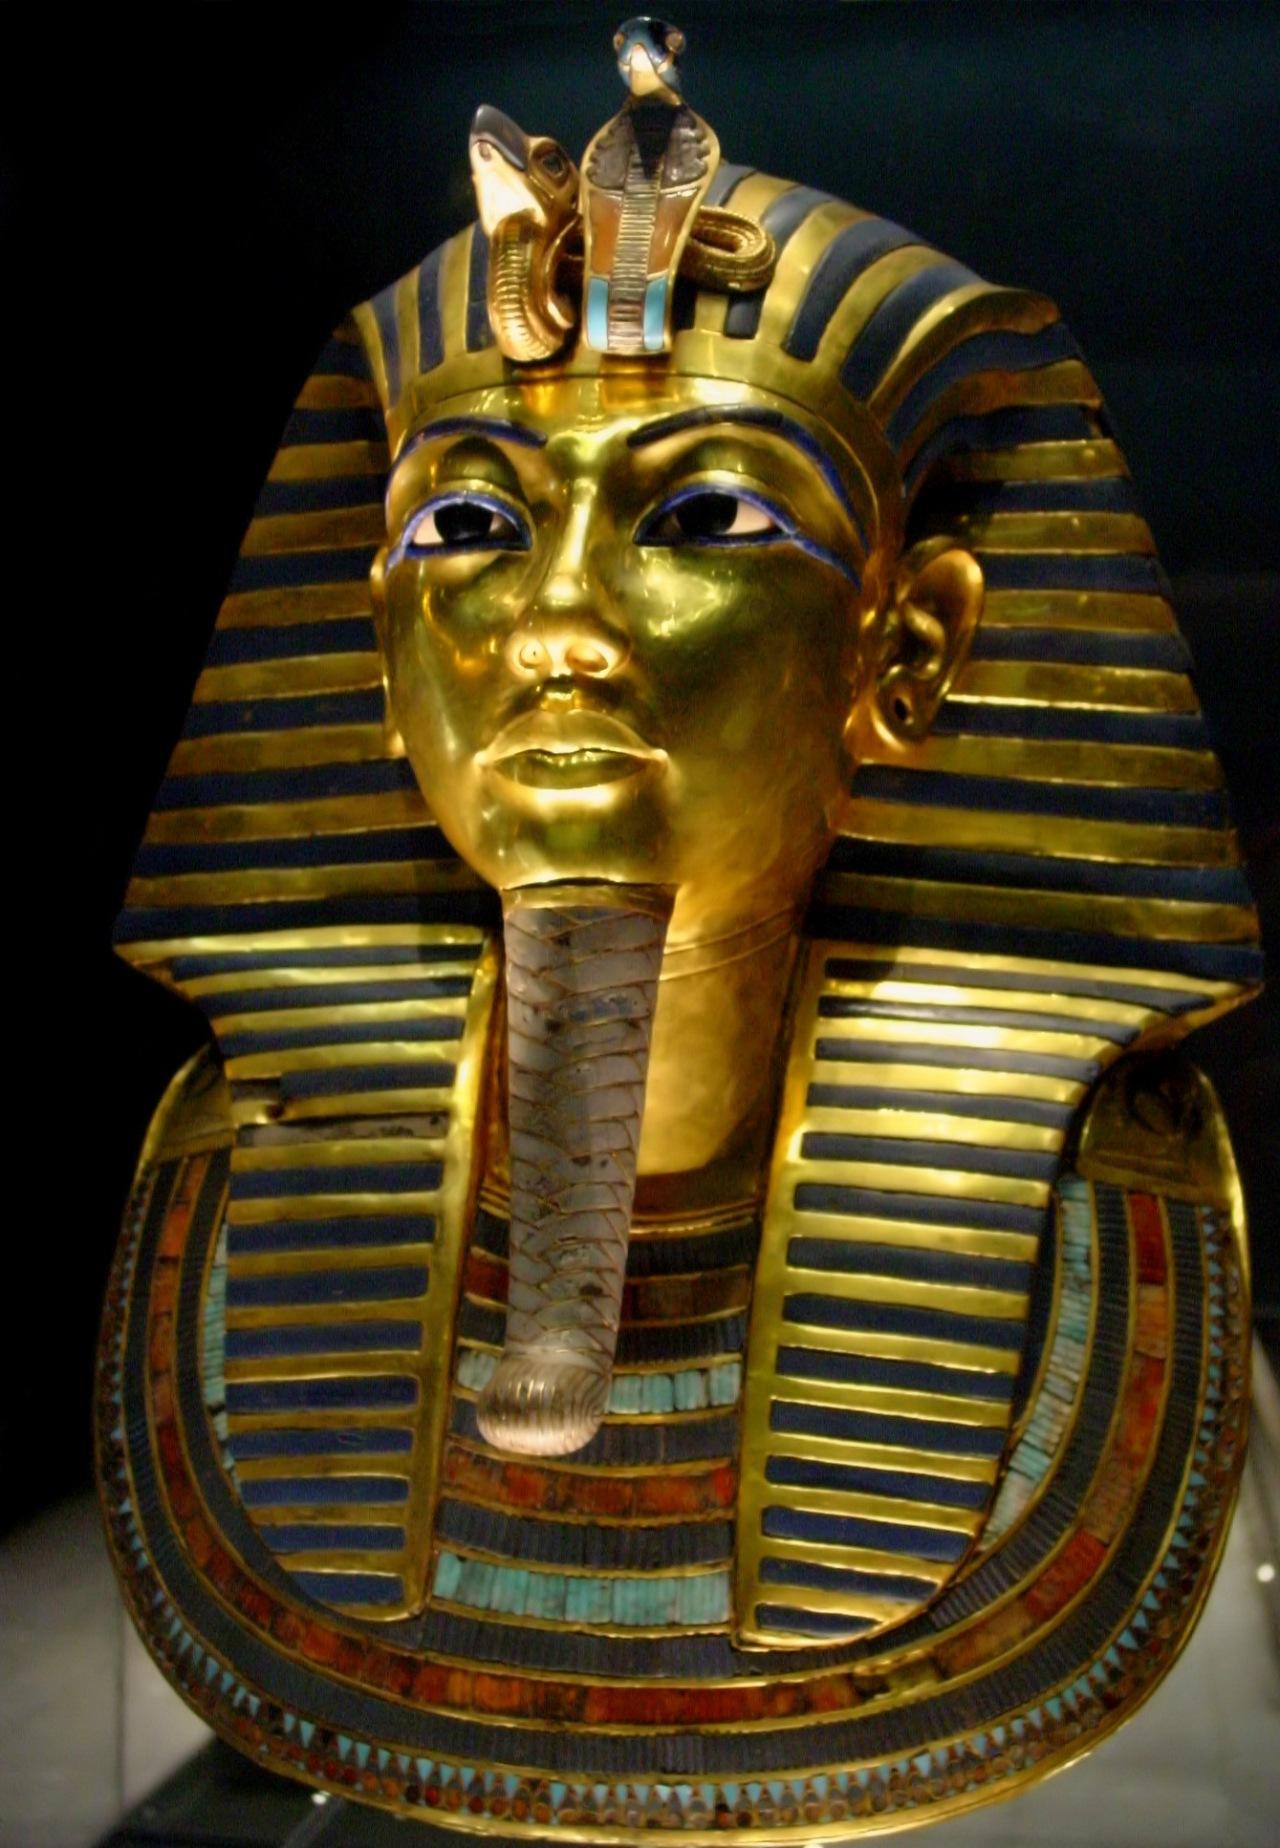 Tutkankhamun mask very accessible inside the museum